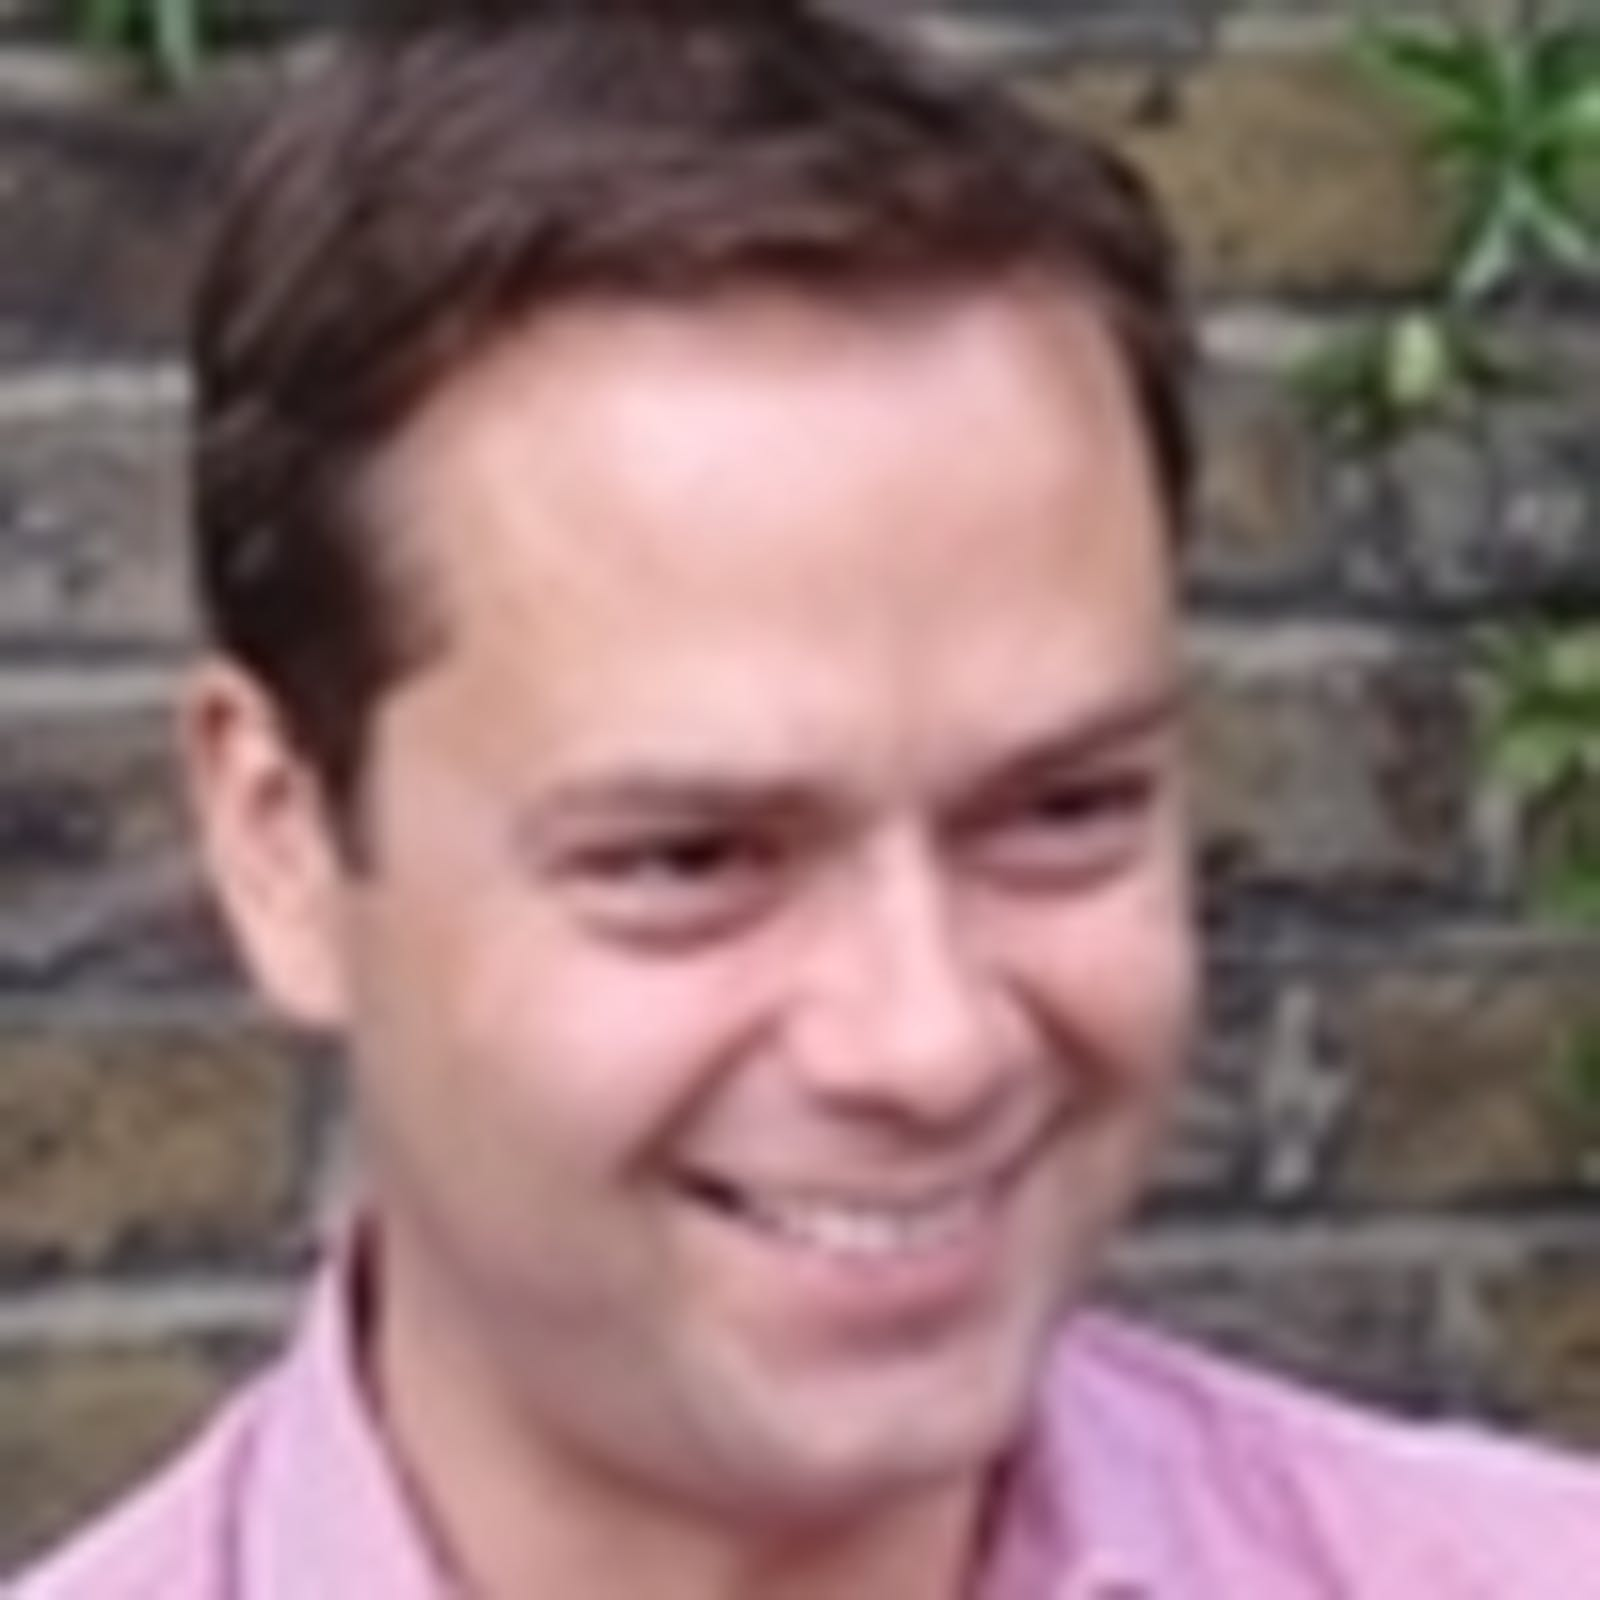 Adrian Sturges